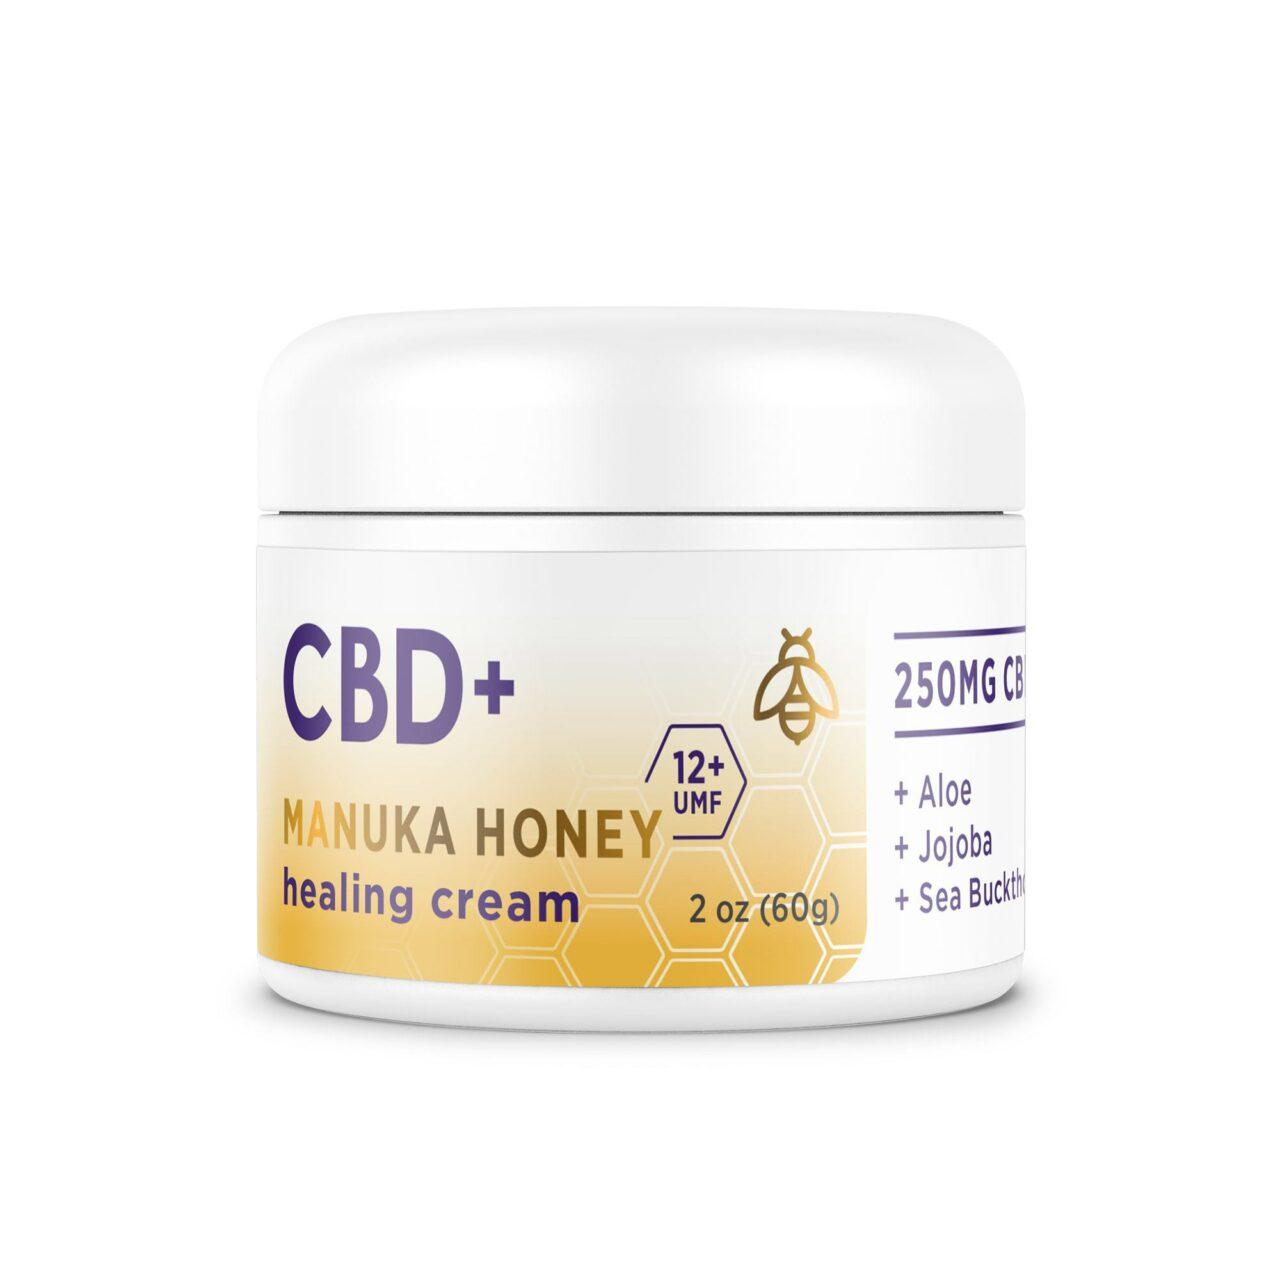 Medterra, CBD + Manuka Honey Cream, Isolate THC-Free, 2oz, 250mg CBD 1